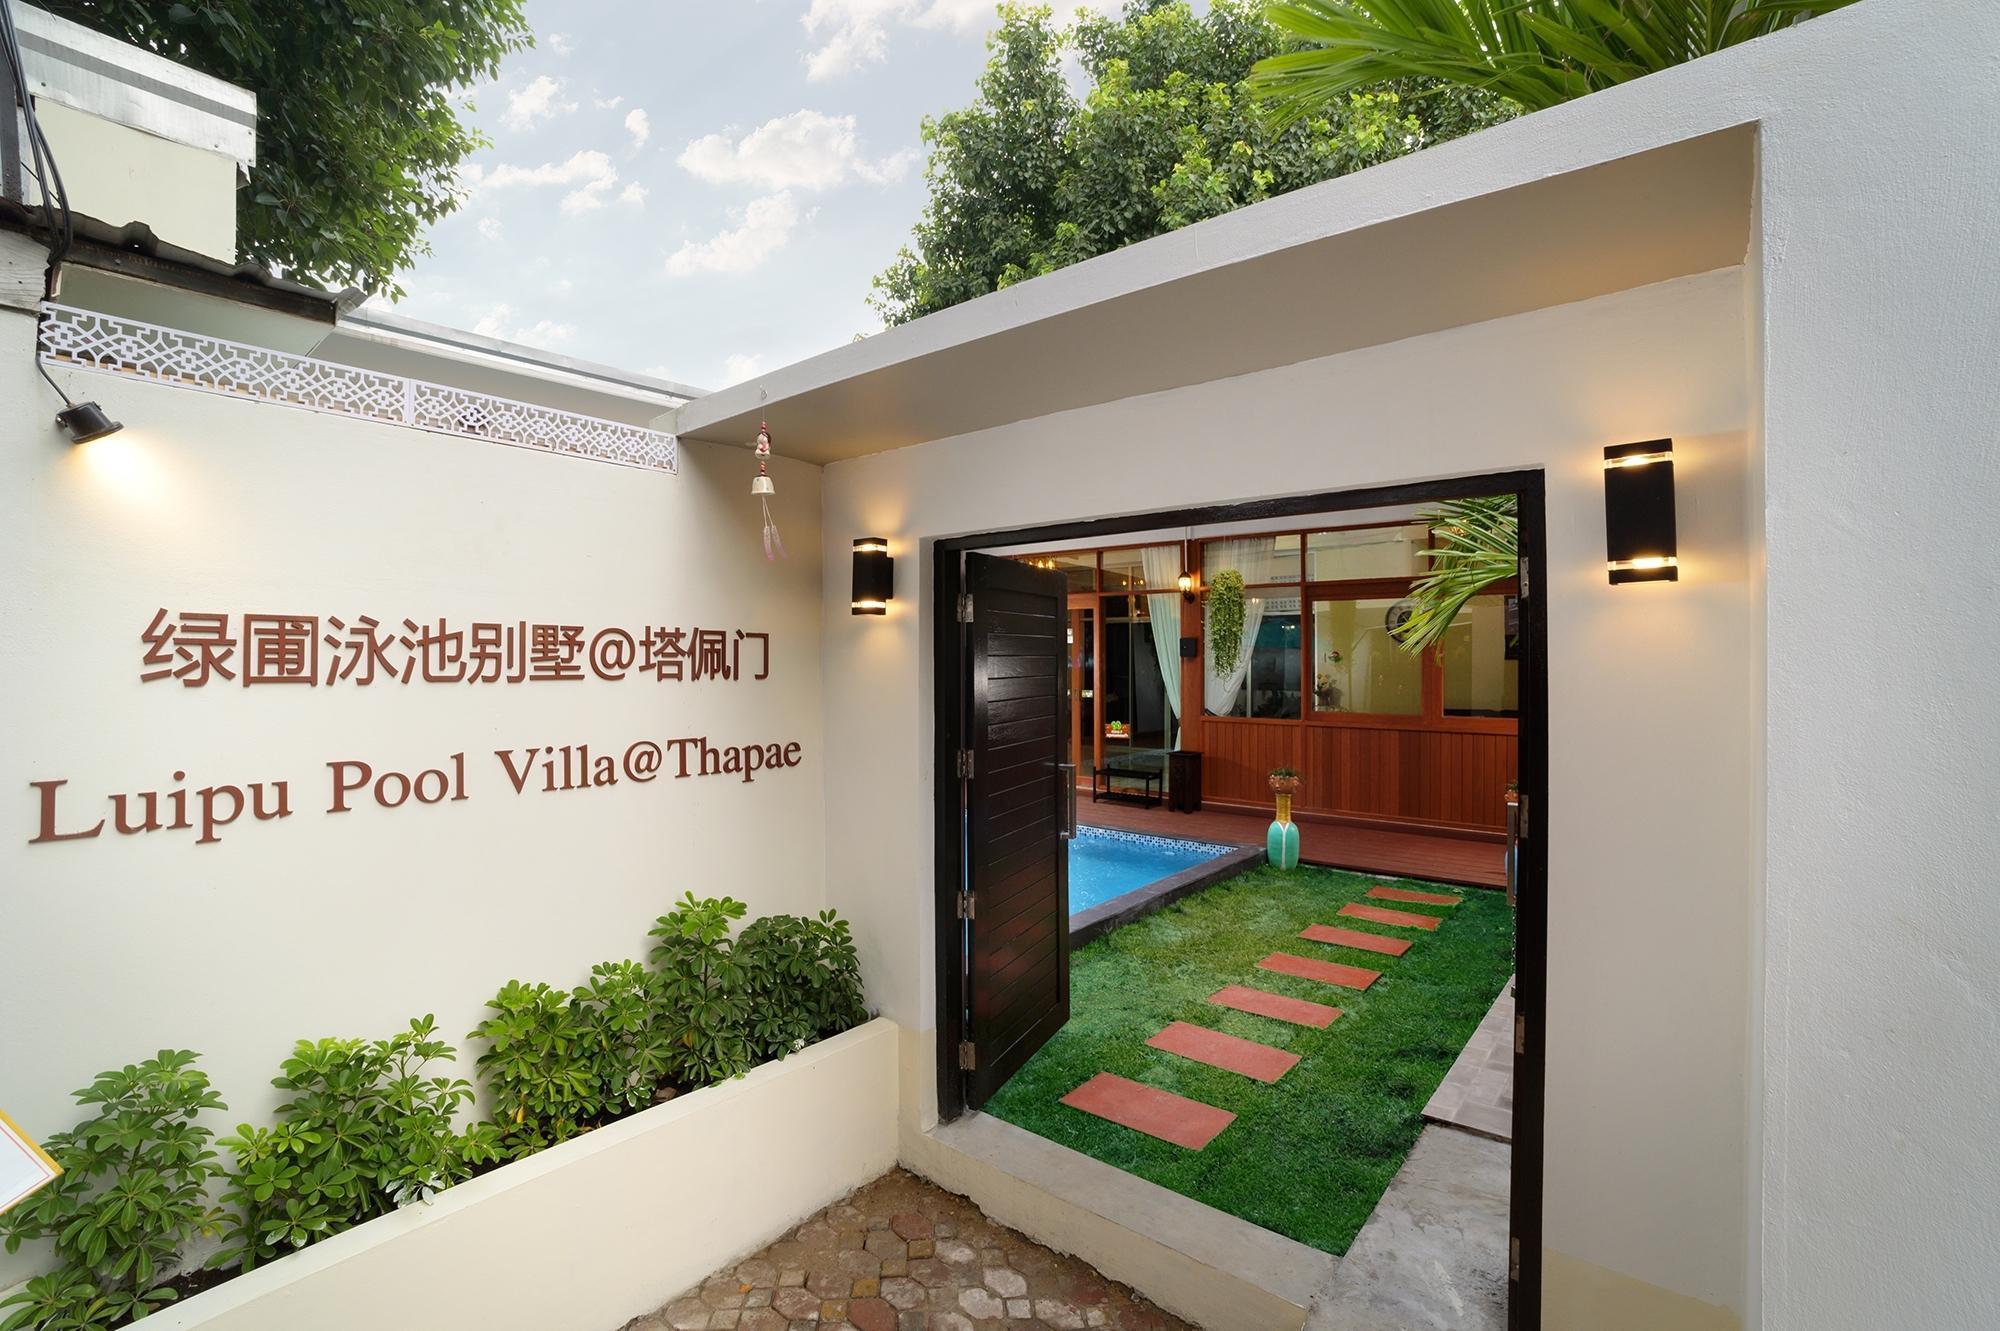 Luipu Pool Villa@Thapae